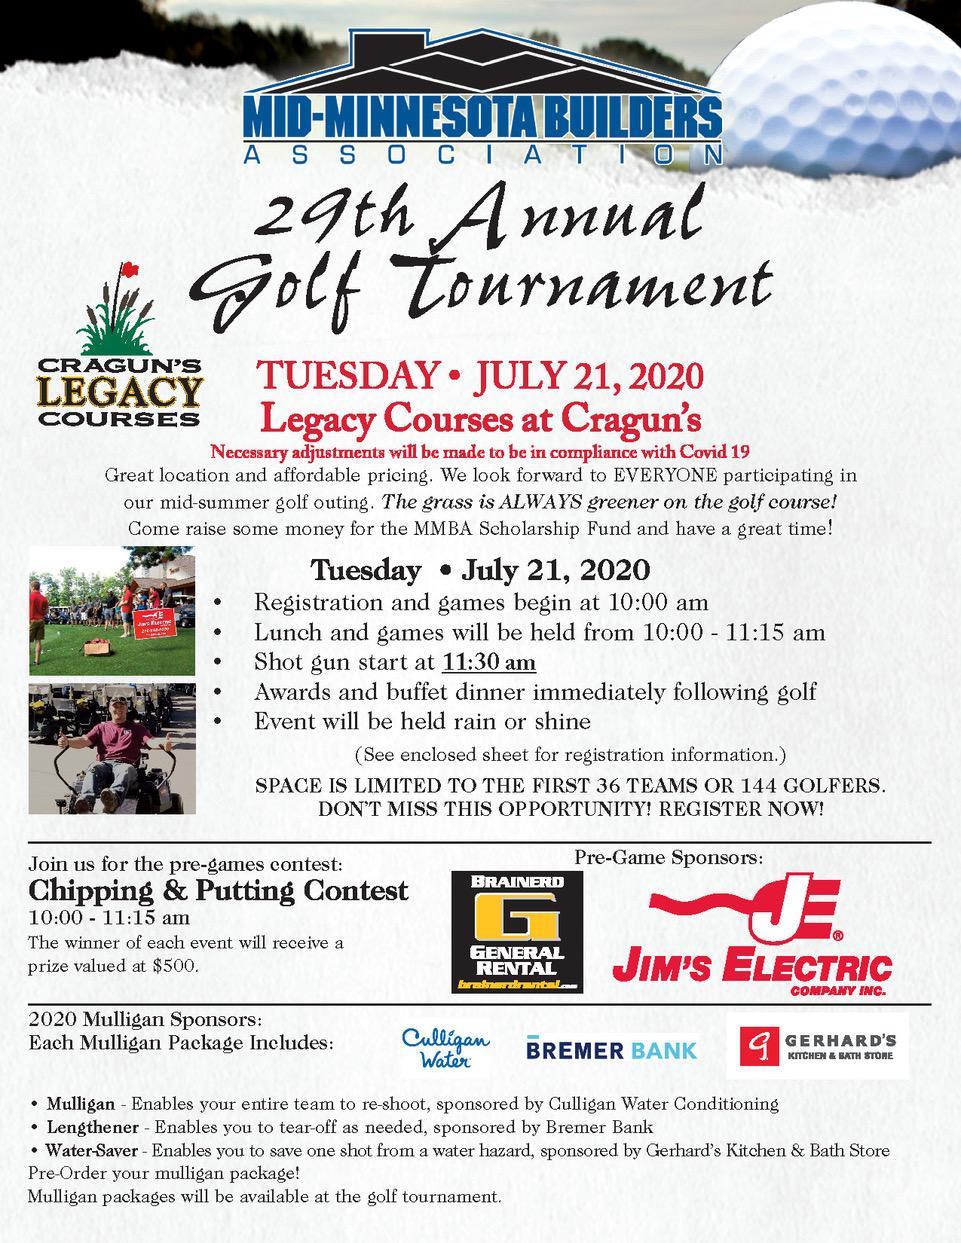 Golf-tournament-information-2.jpg